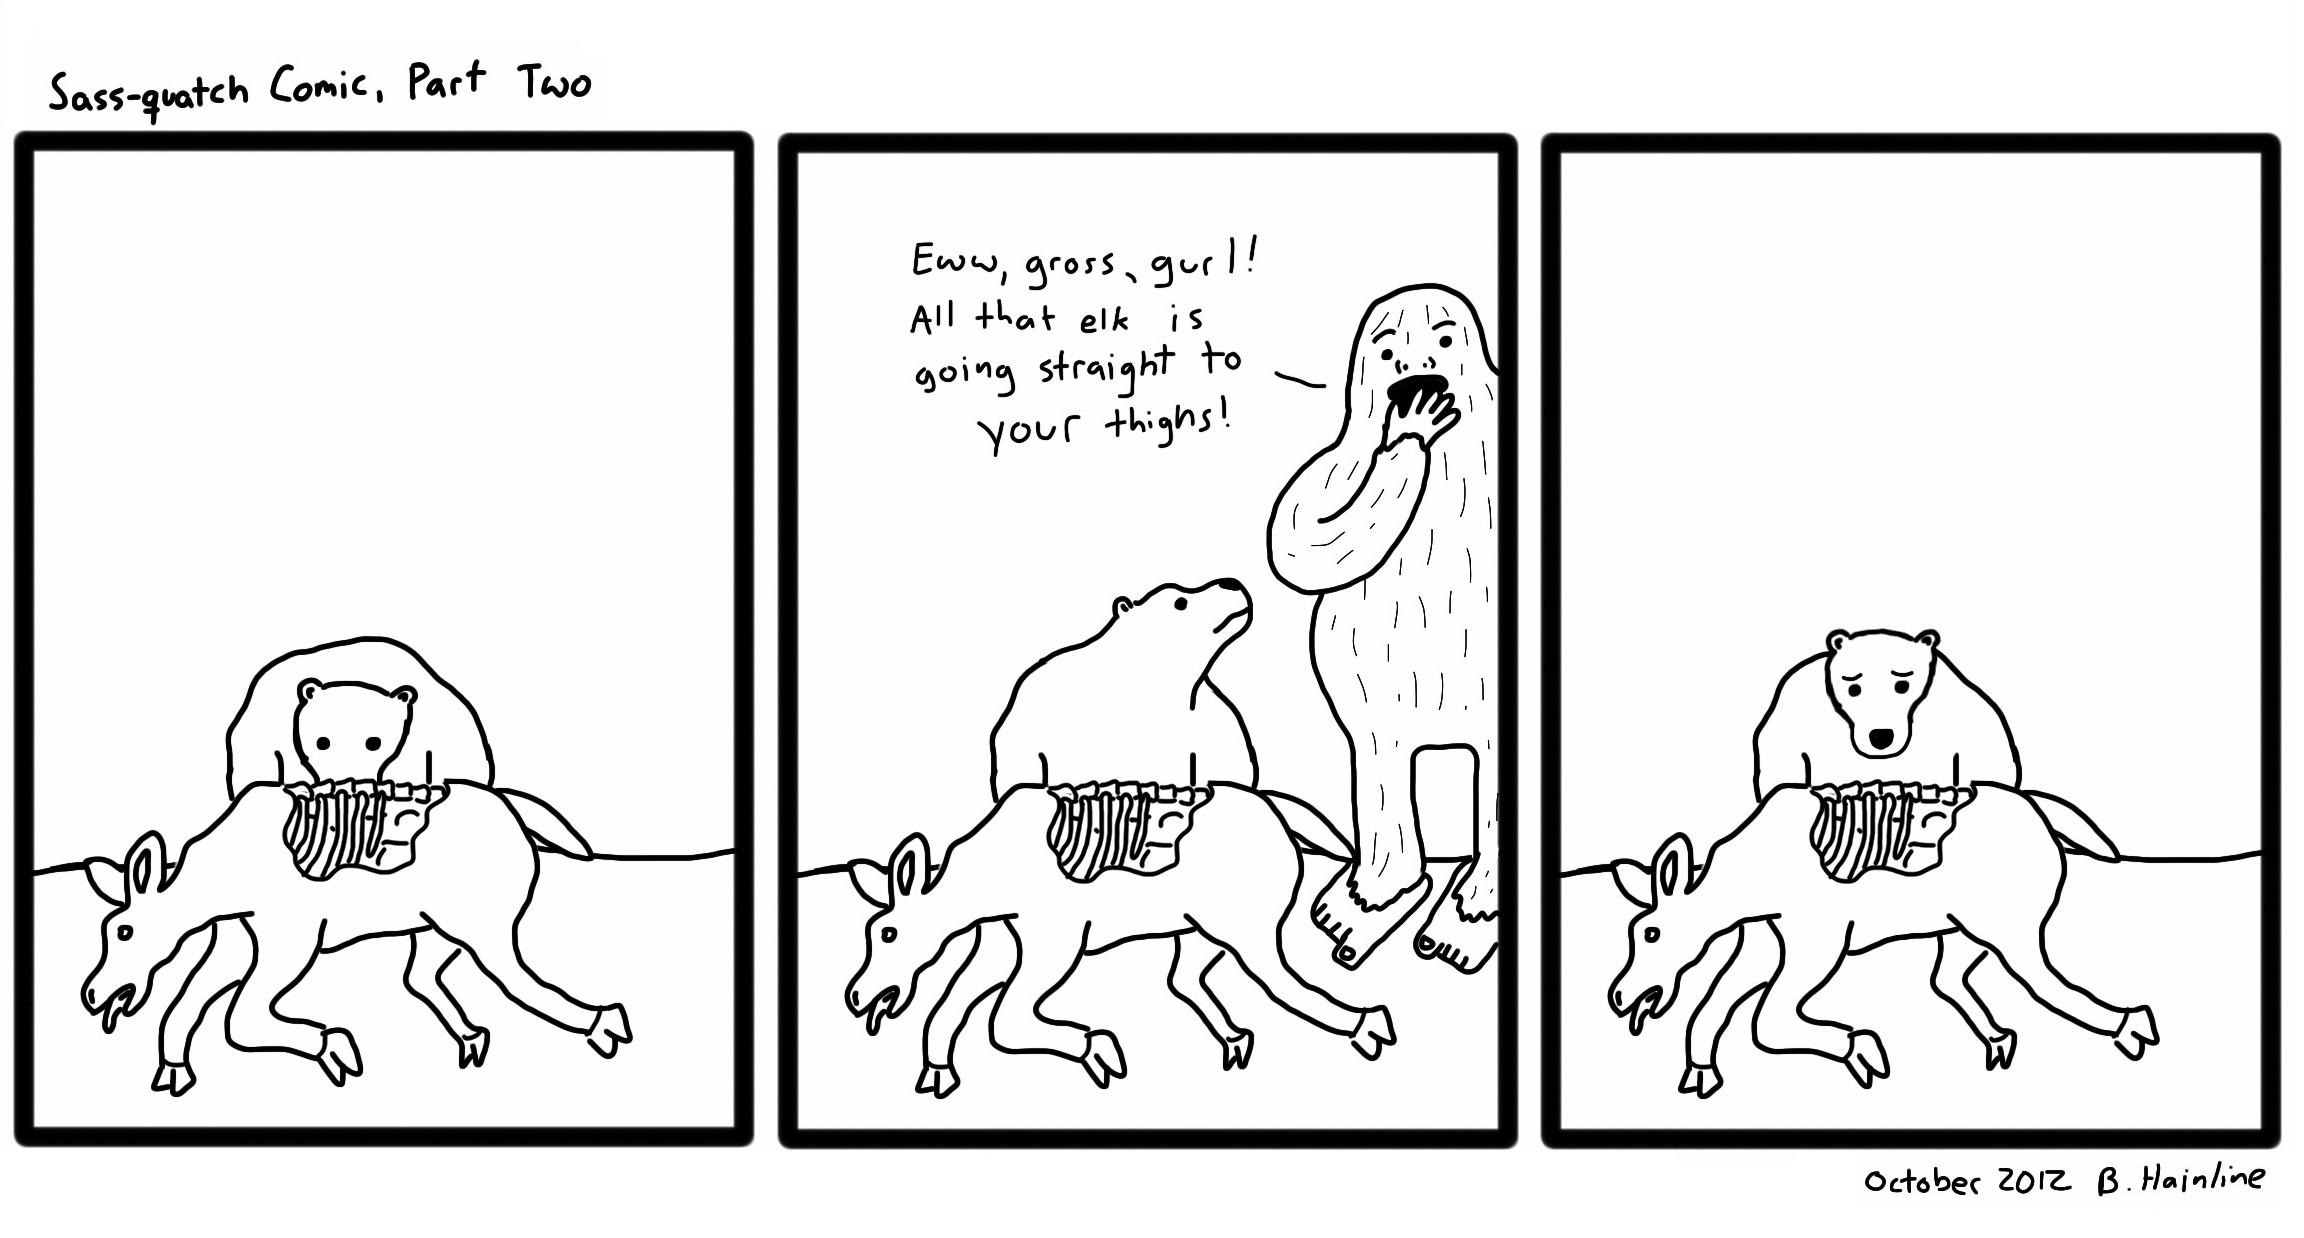 Sass-quatch Comic, Part Two